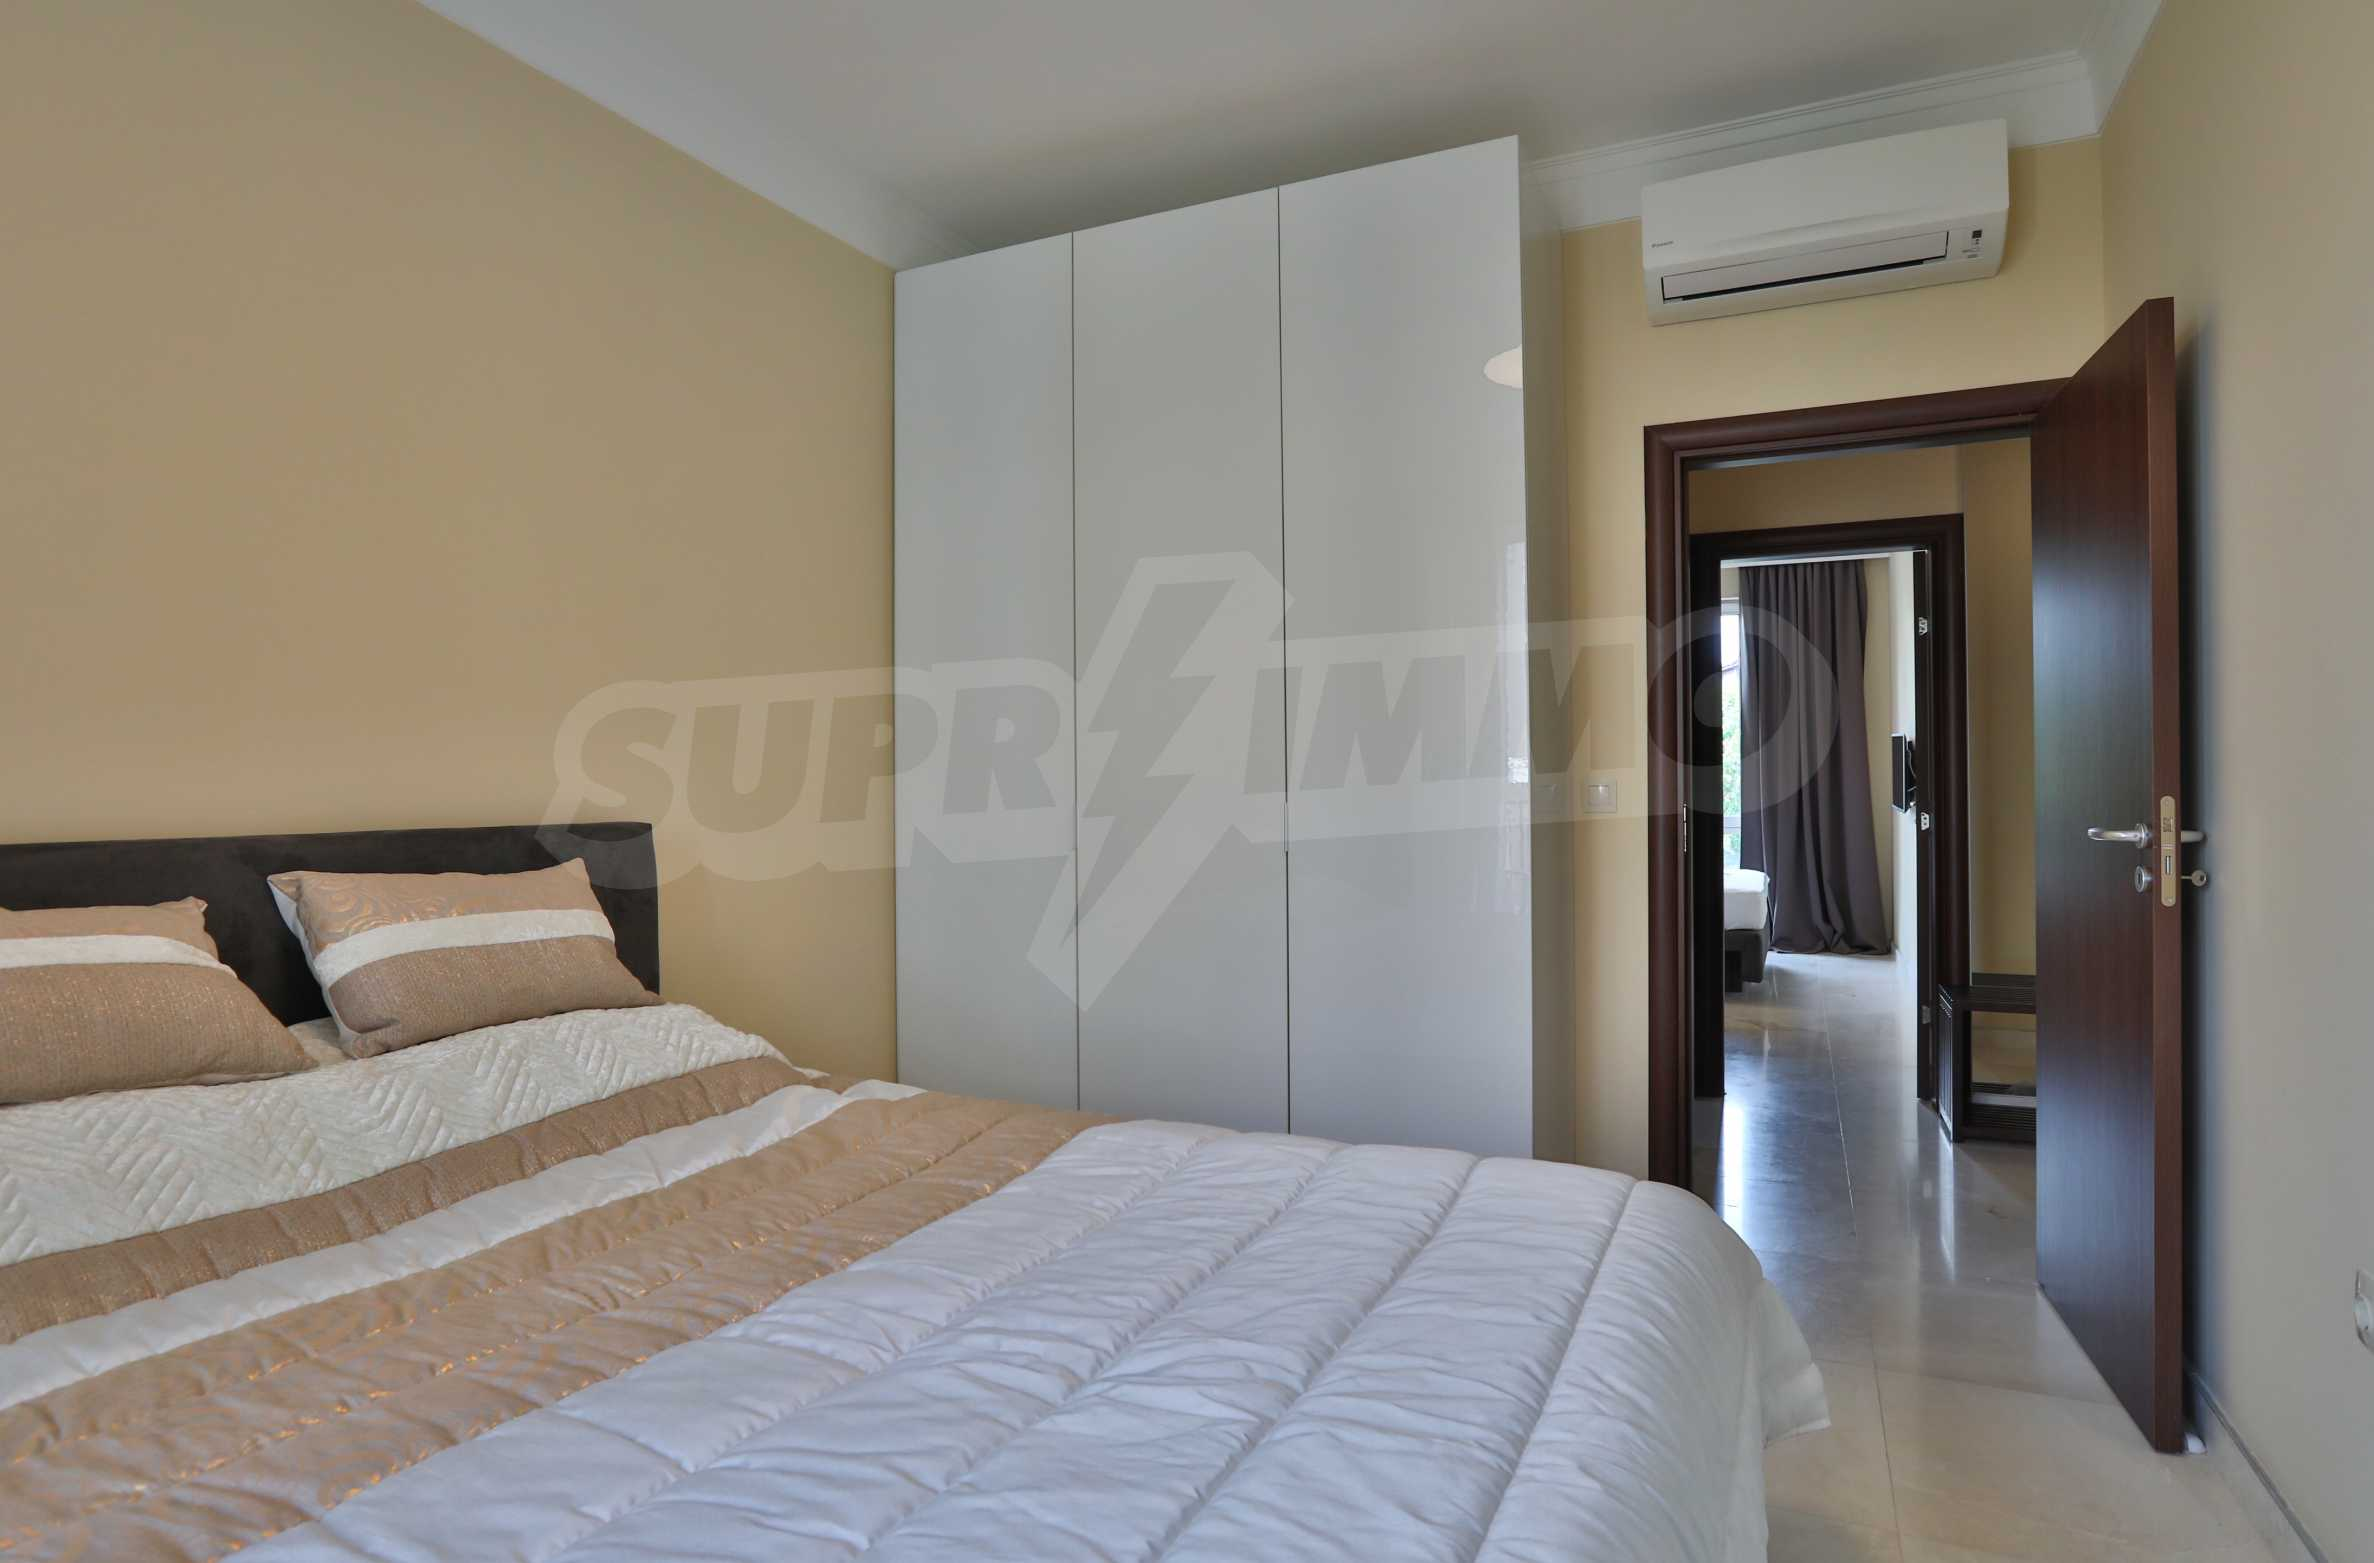 Exclusive 2-bedroom beachfront apartment in the prestigious Belle Époque Beach Residence 16